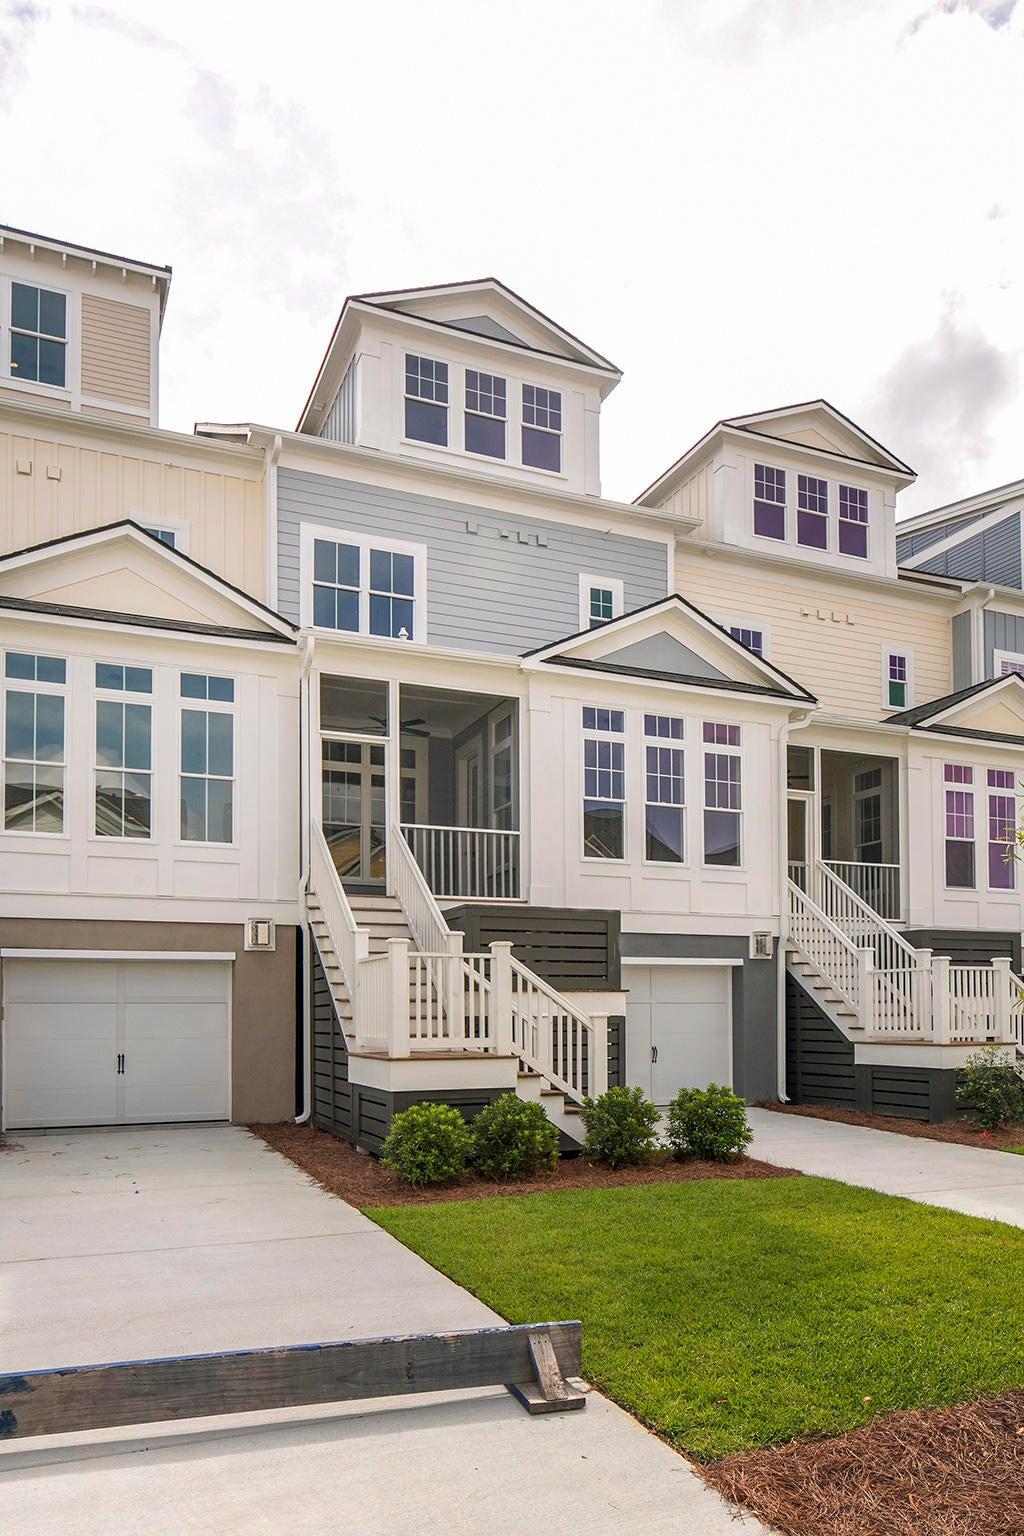 Daniel Island Homes For Sale - 1713 Frissel, Daniel Island, SC - 25